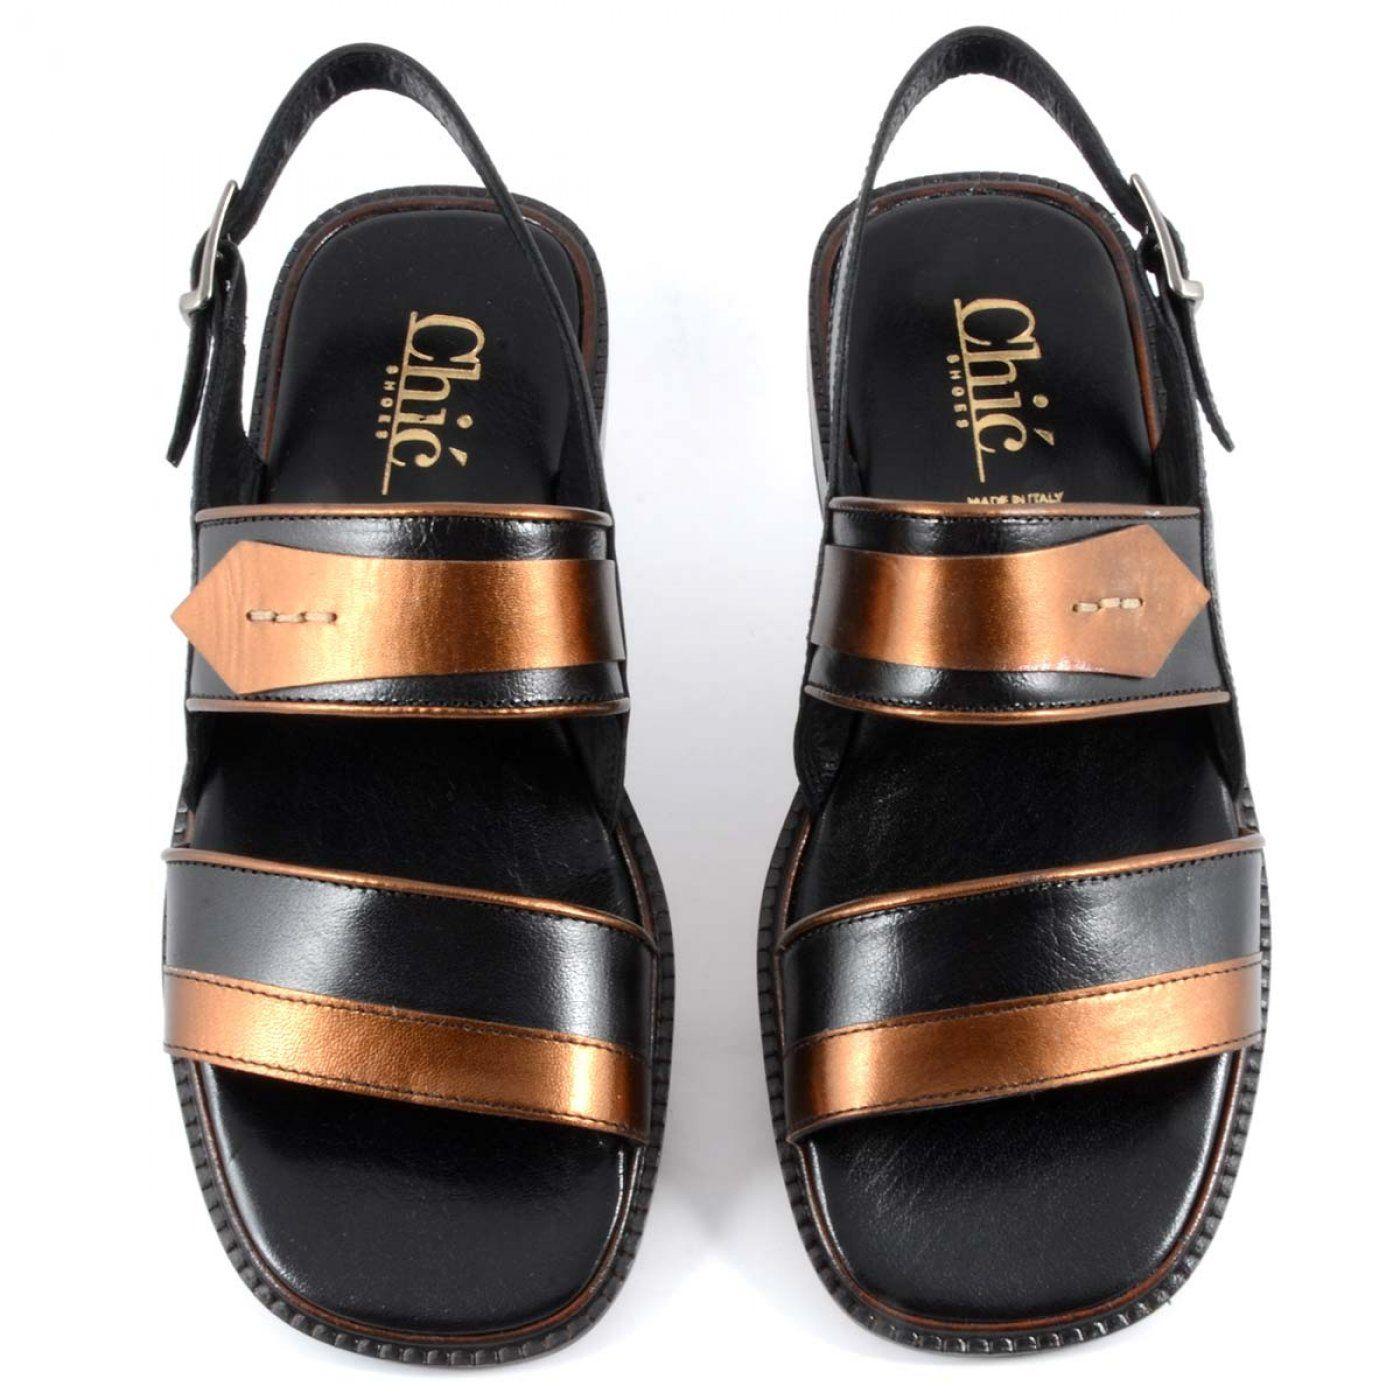 Black Color Designer Sandal For Men   Chic Shoes Italy in Dubai, Saudi  Arabia, GCC b2c9dbe072c